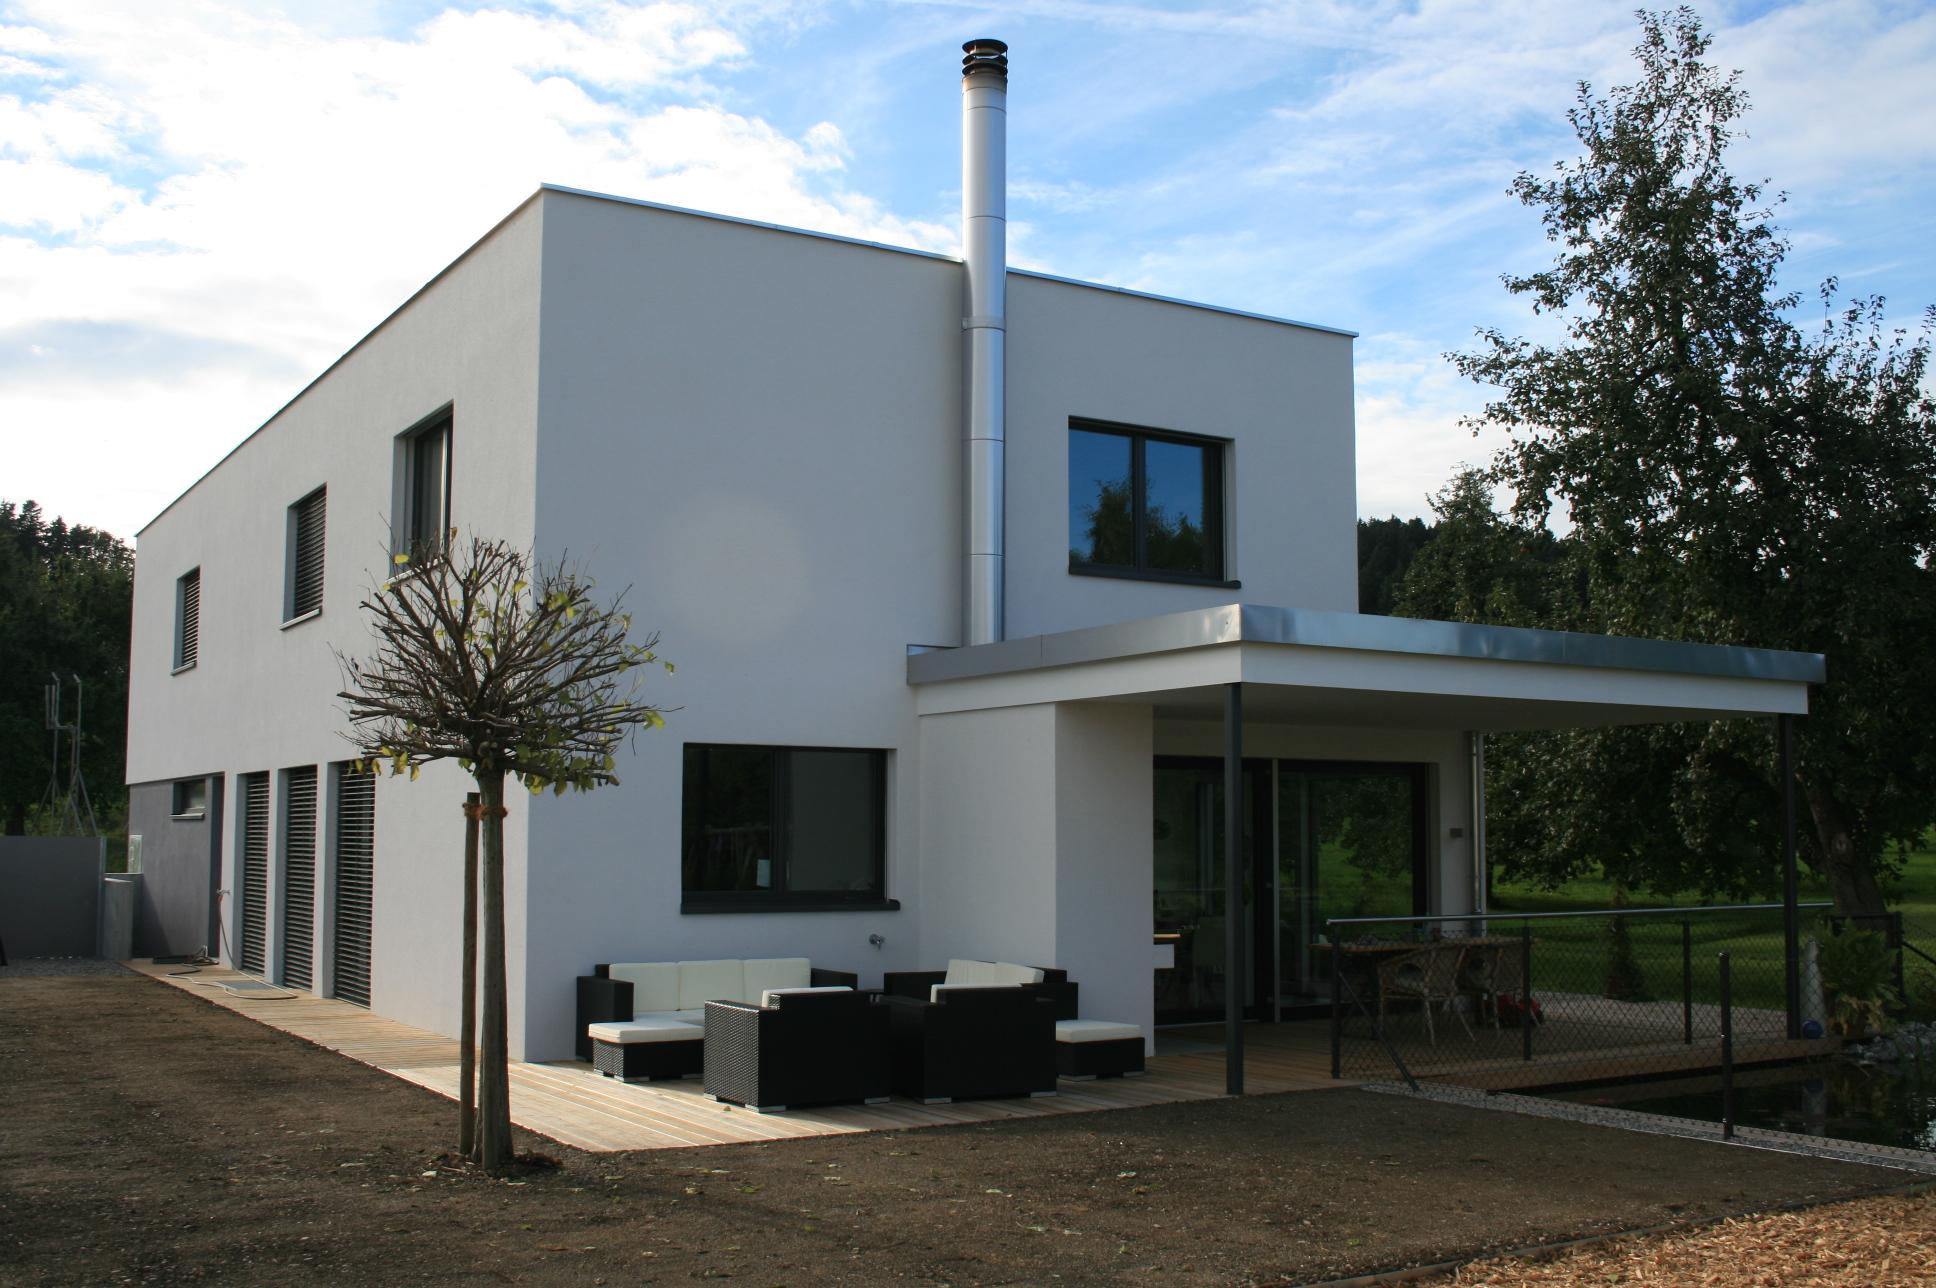 Neubau EFH mit Büroteil, Minergie, gebaut nach Vastu ...